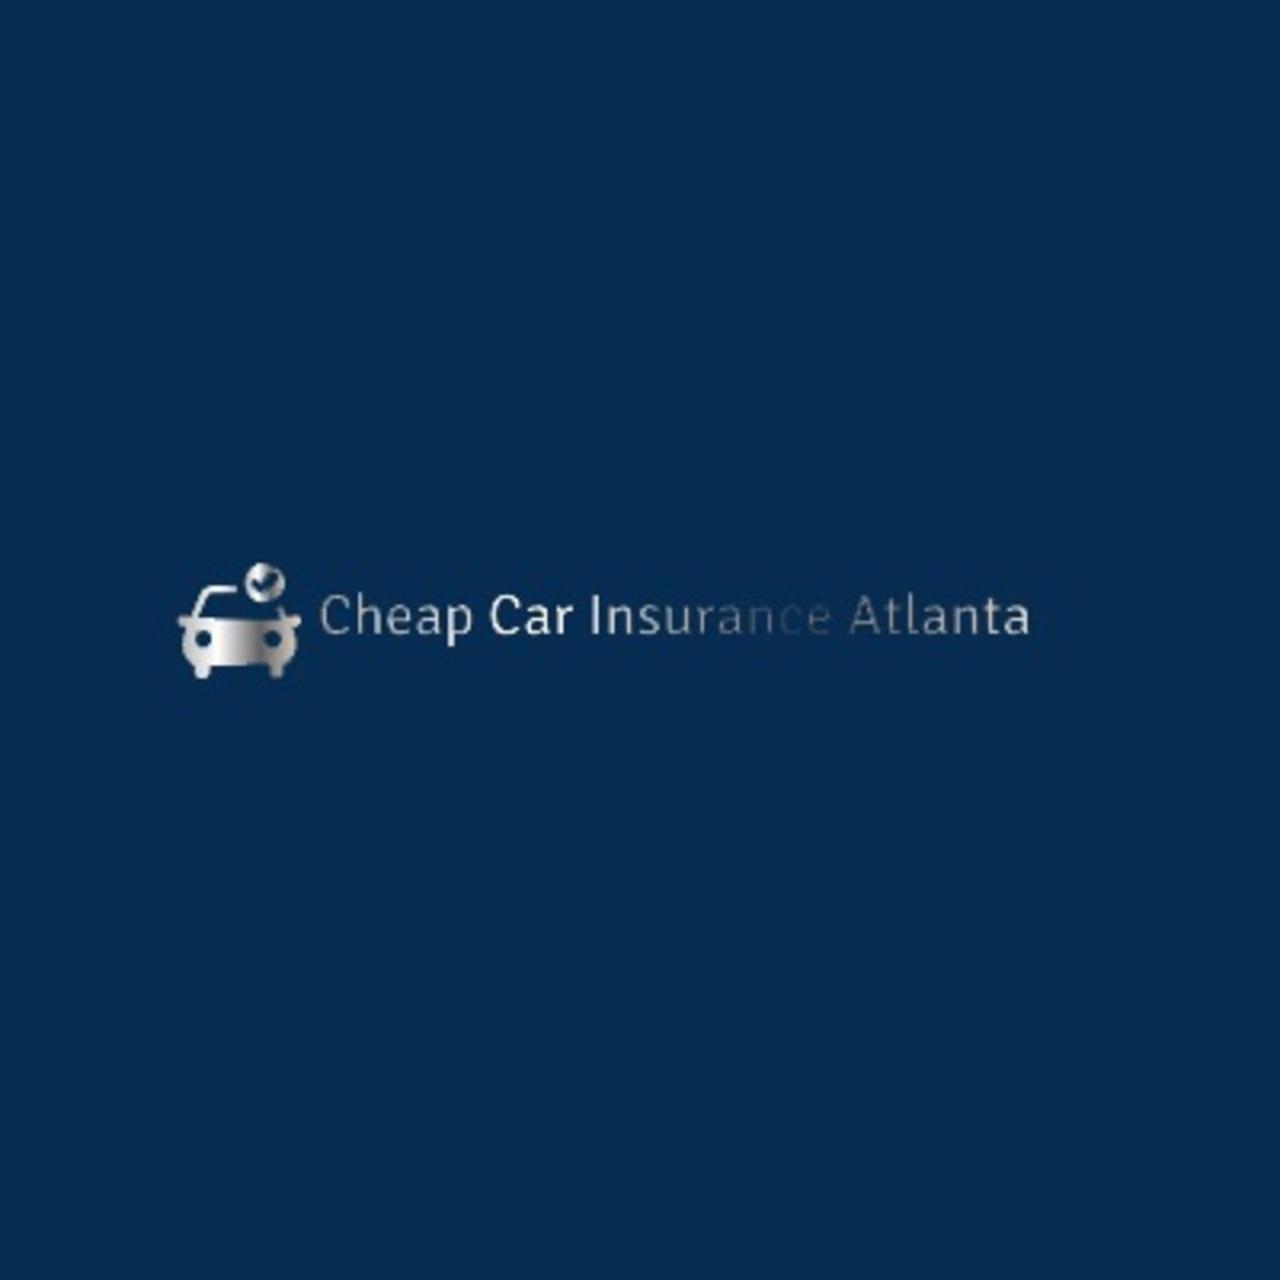 Cheap Car Insurance Atlanta Georgia Center Retreat Guru